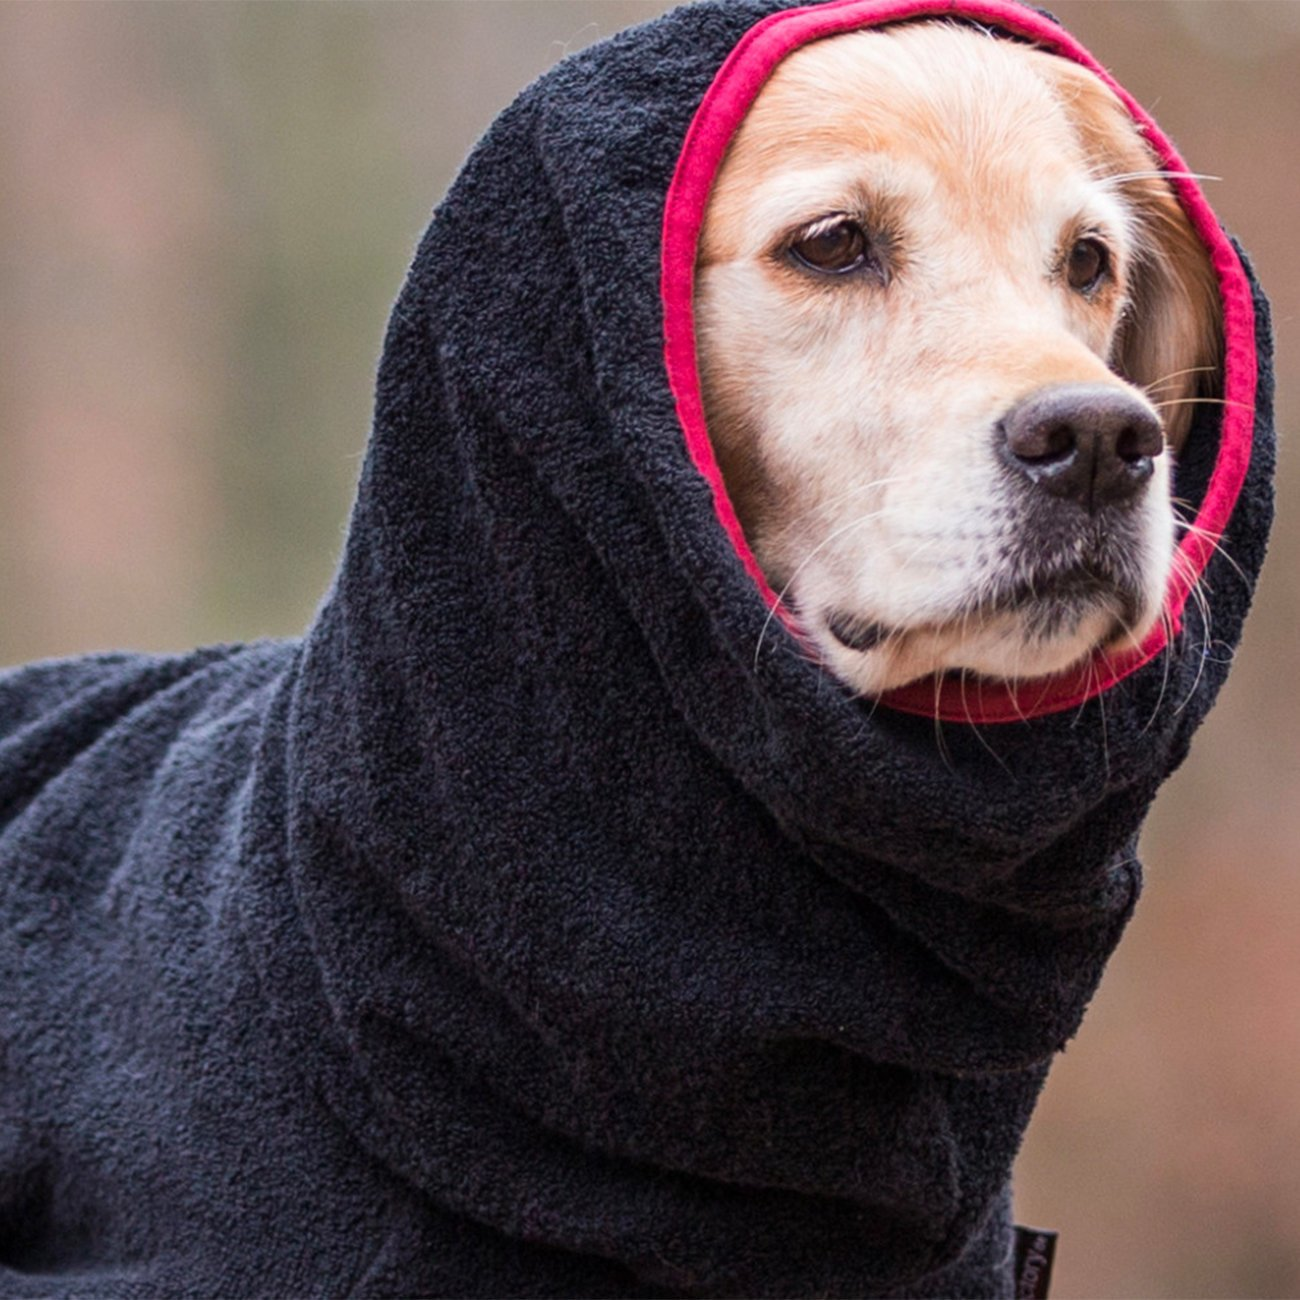 fit4dogs Trockenmantel Hund Dryup Cape, Bild 5